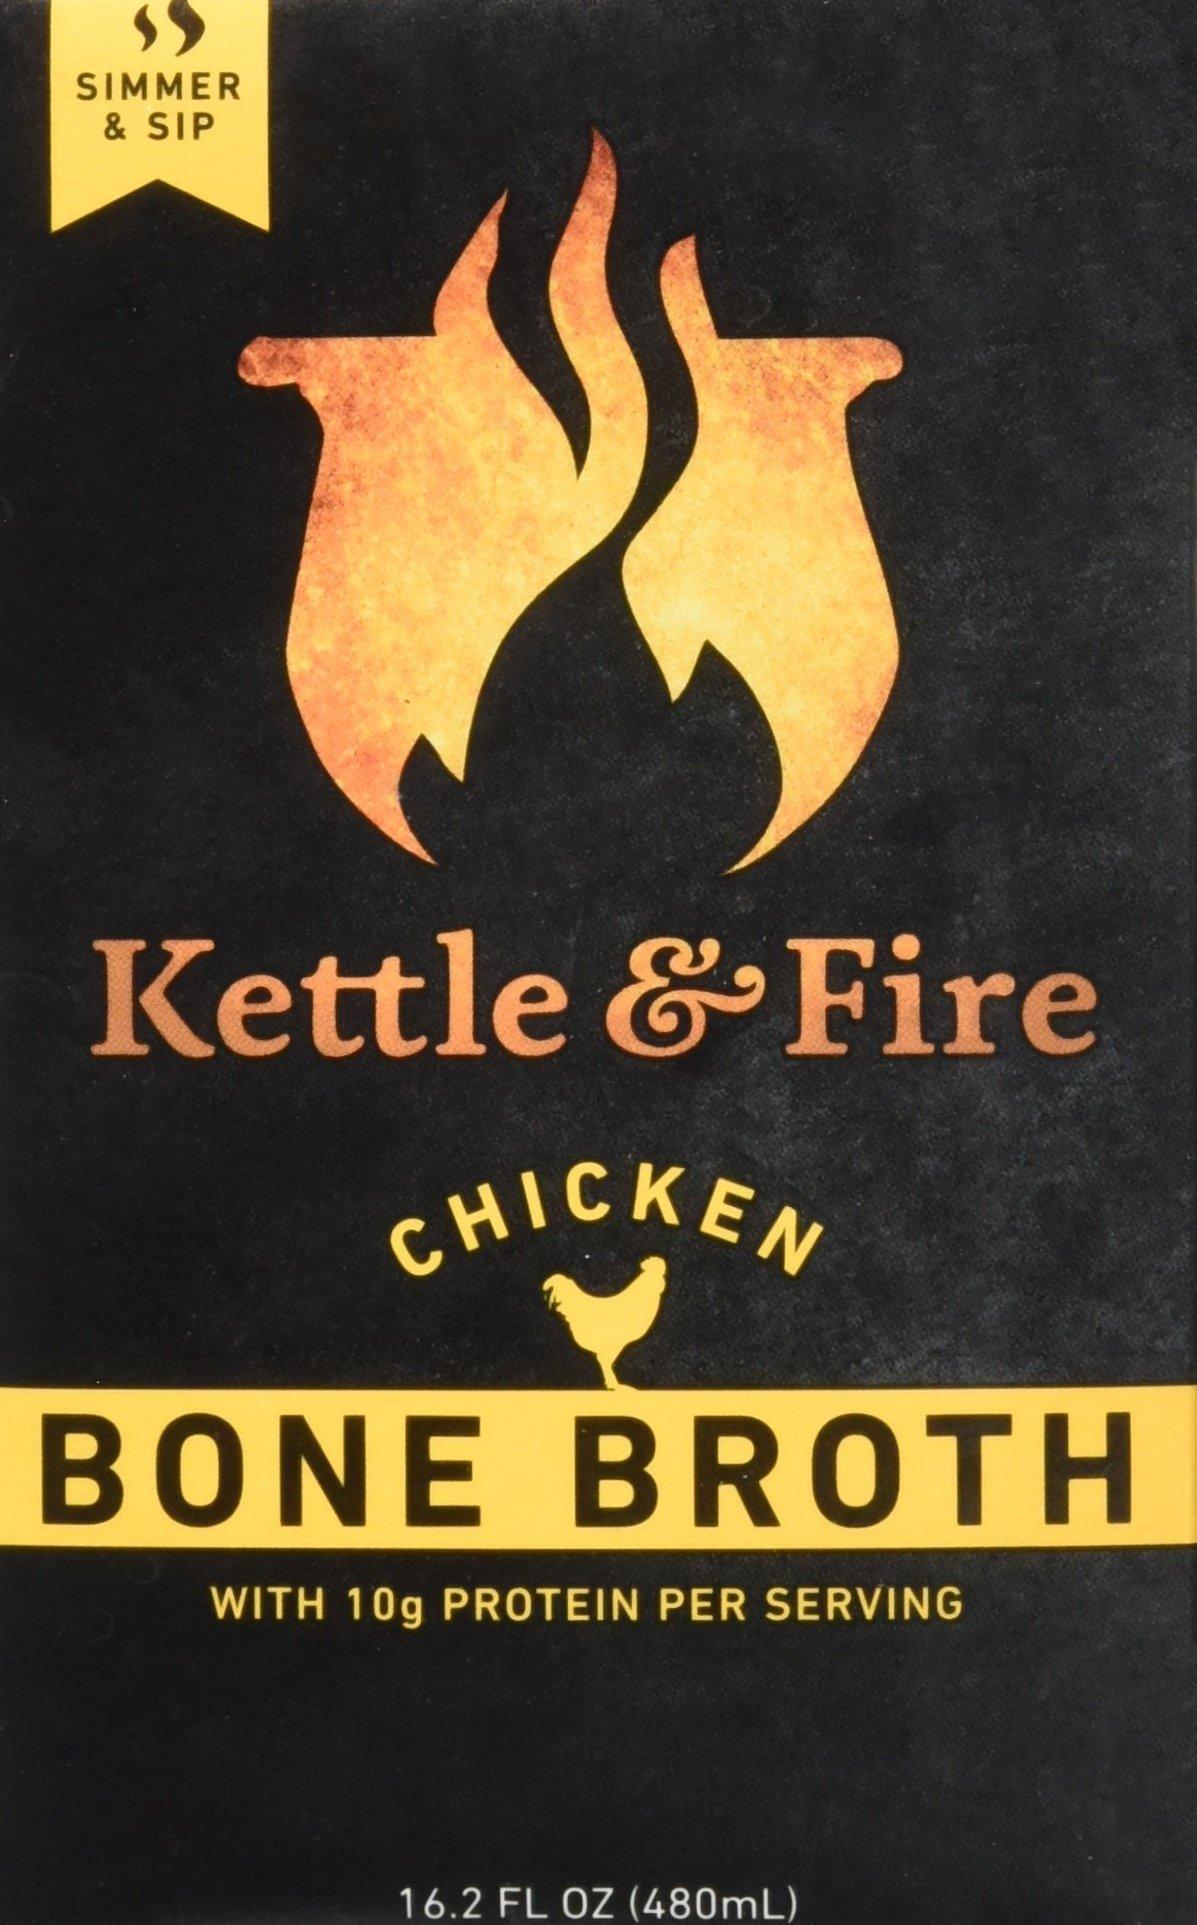 Kettle & Fire Chicken Bone Broth Organic Collagen-rich Bone Broth, 16.2 ounce